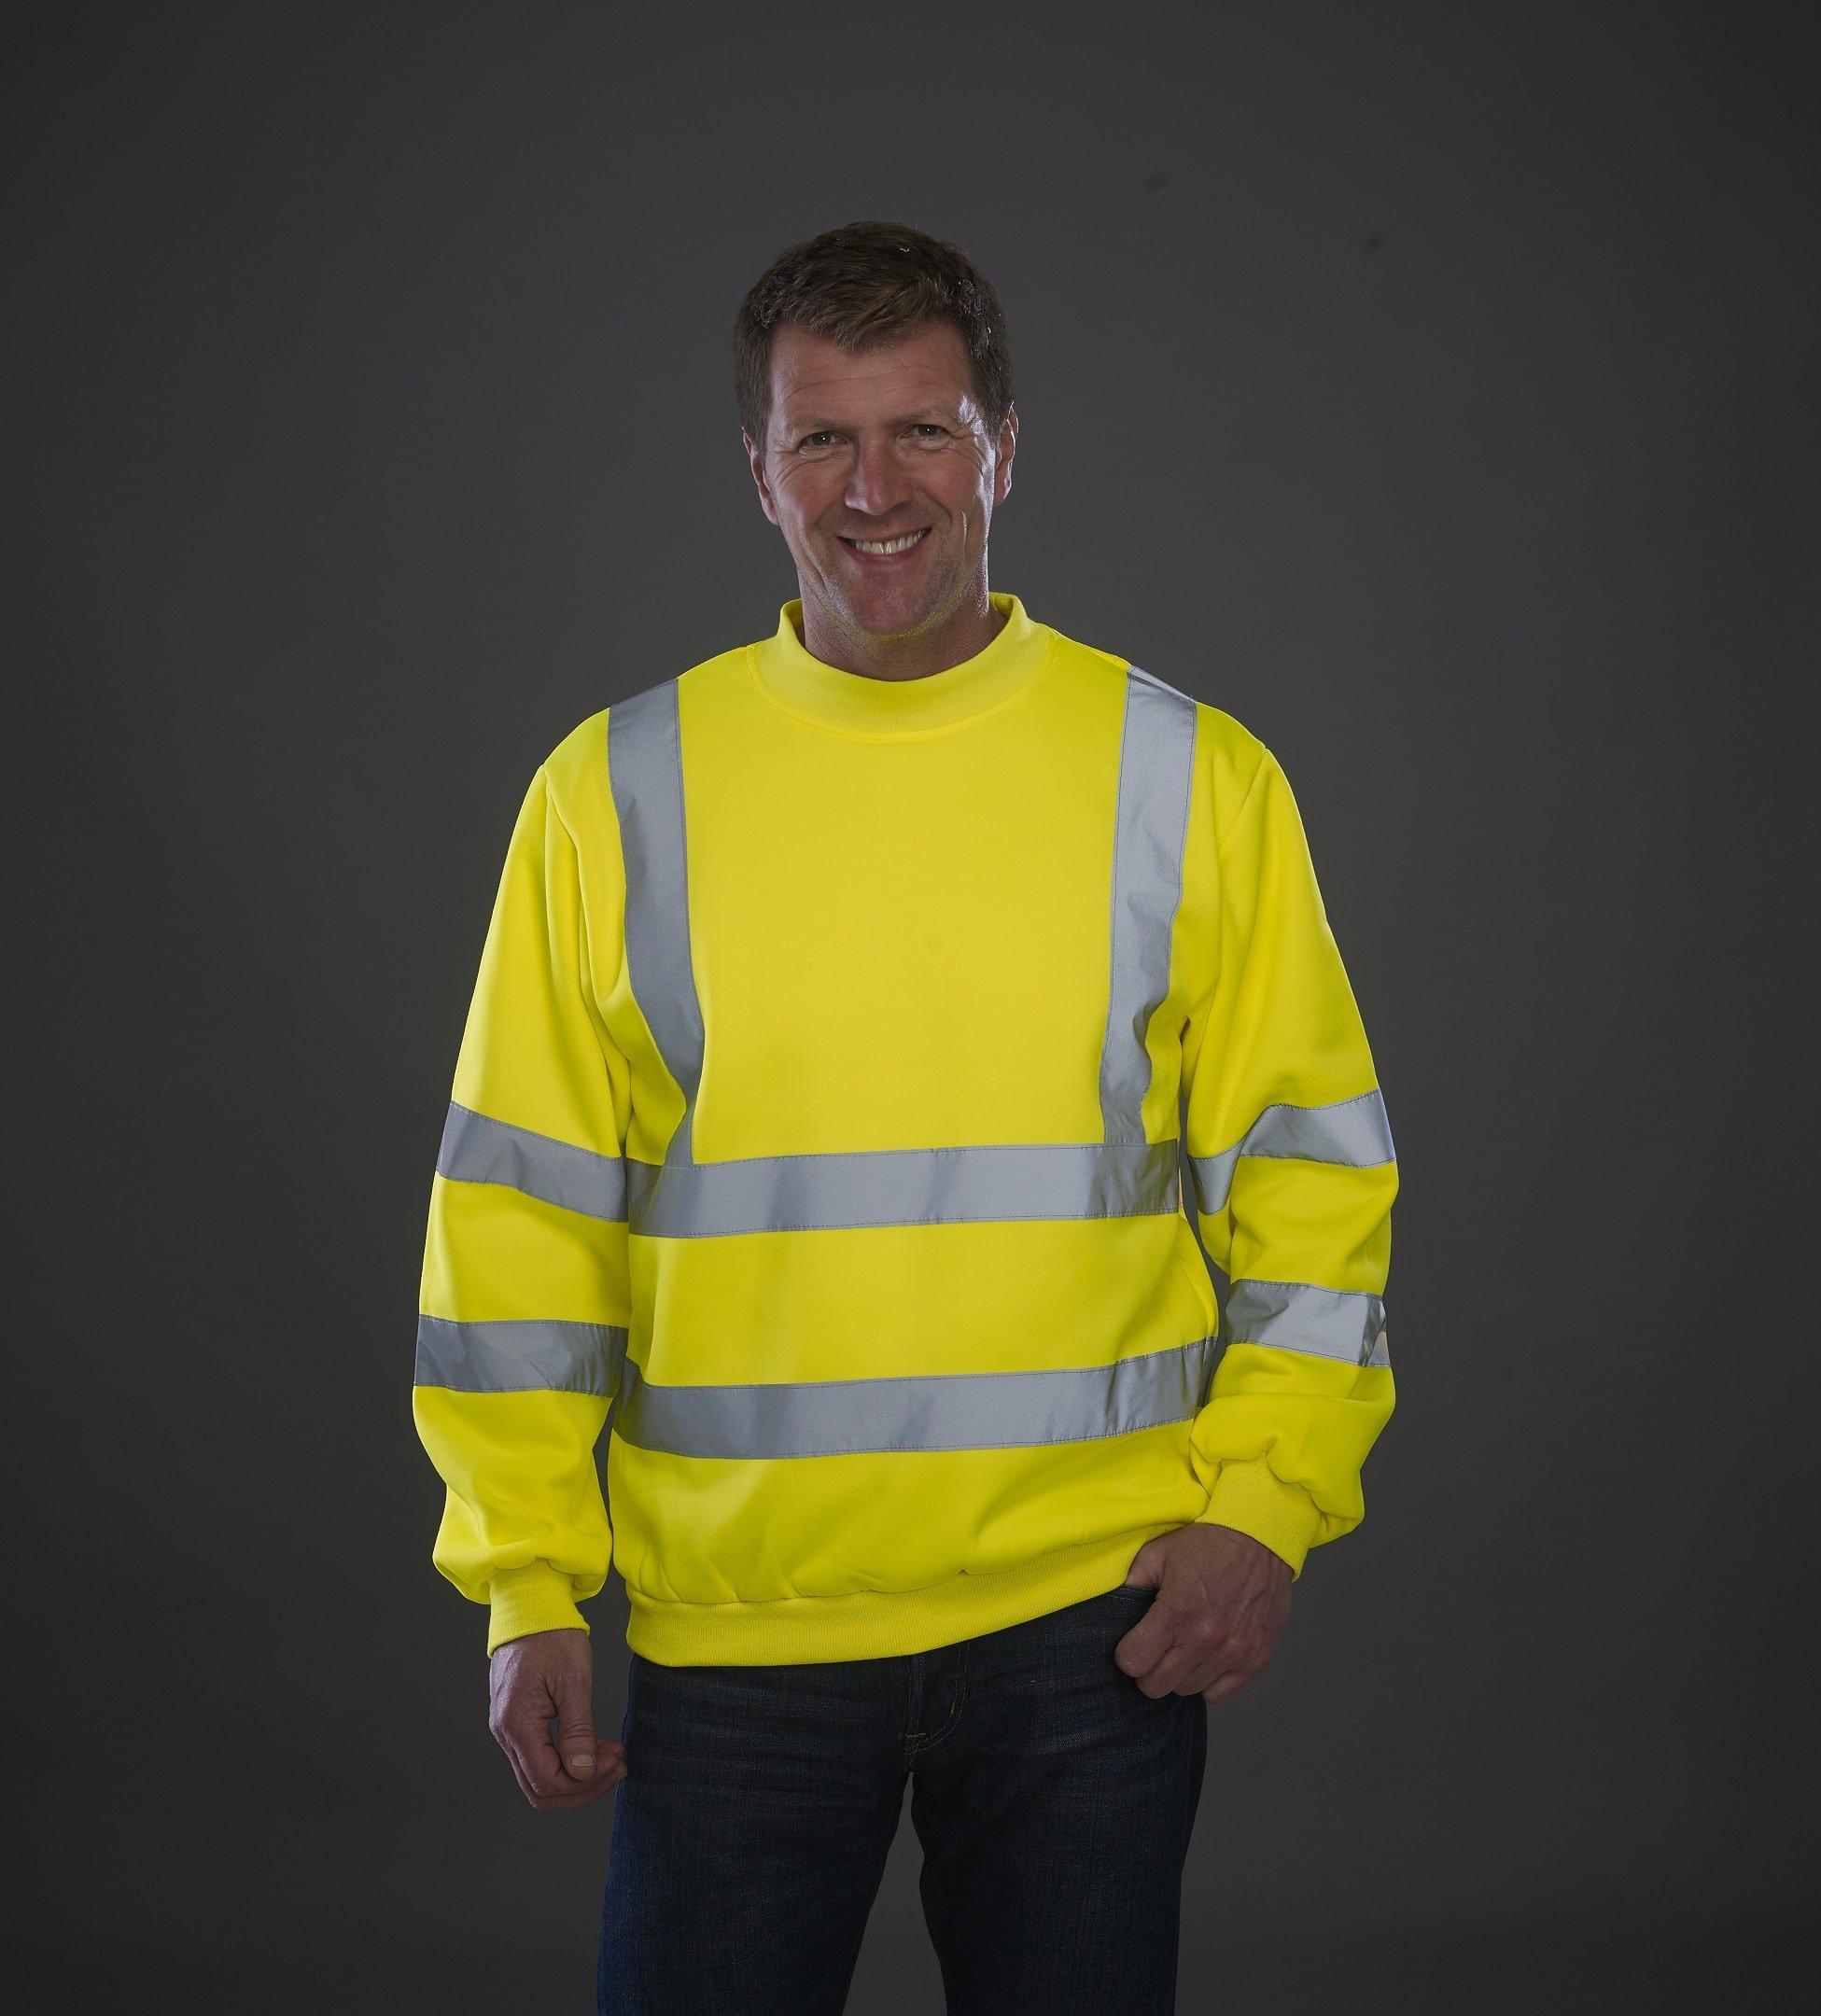 Personalised  Hi-Vis Fleece/ Sweatshirt with logo HVJ510, www.ontimeprint.co.uk